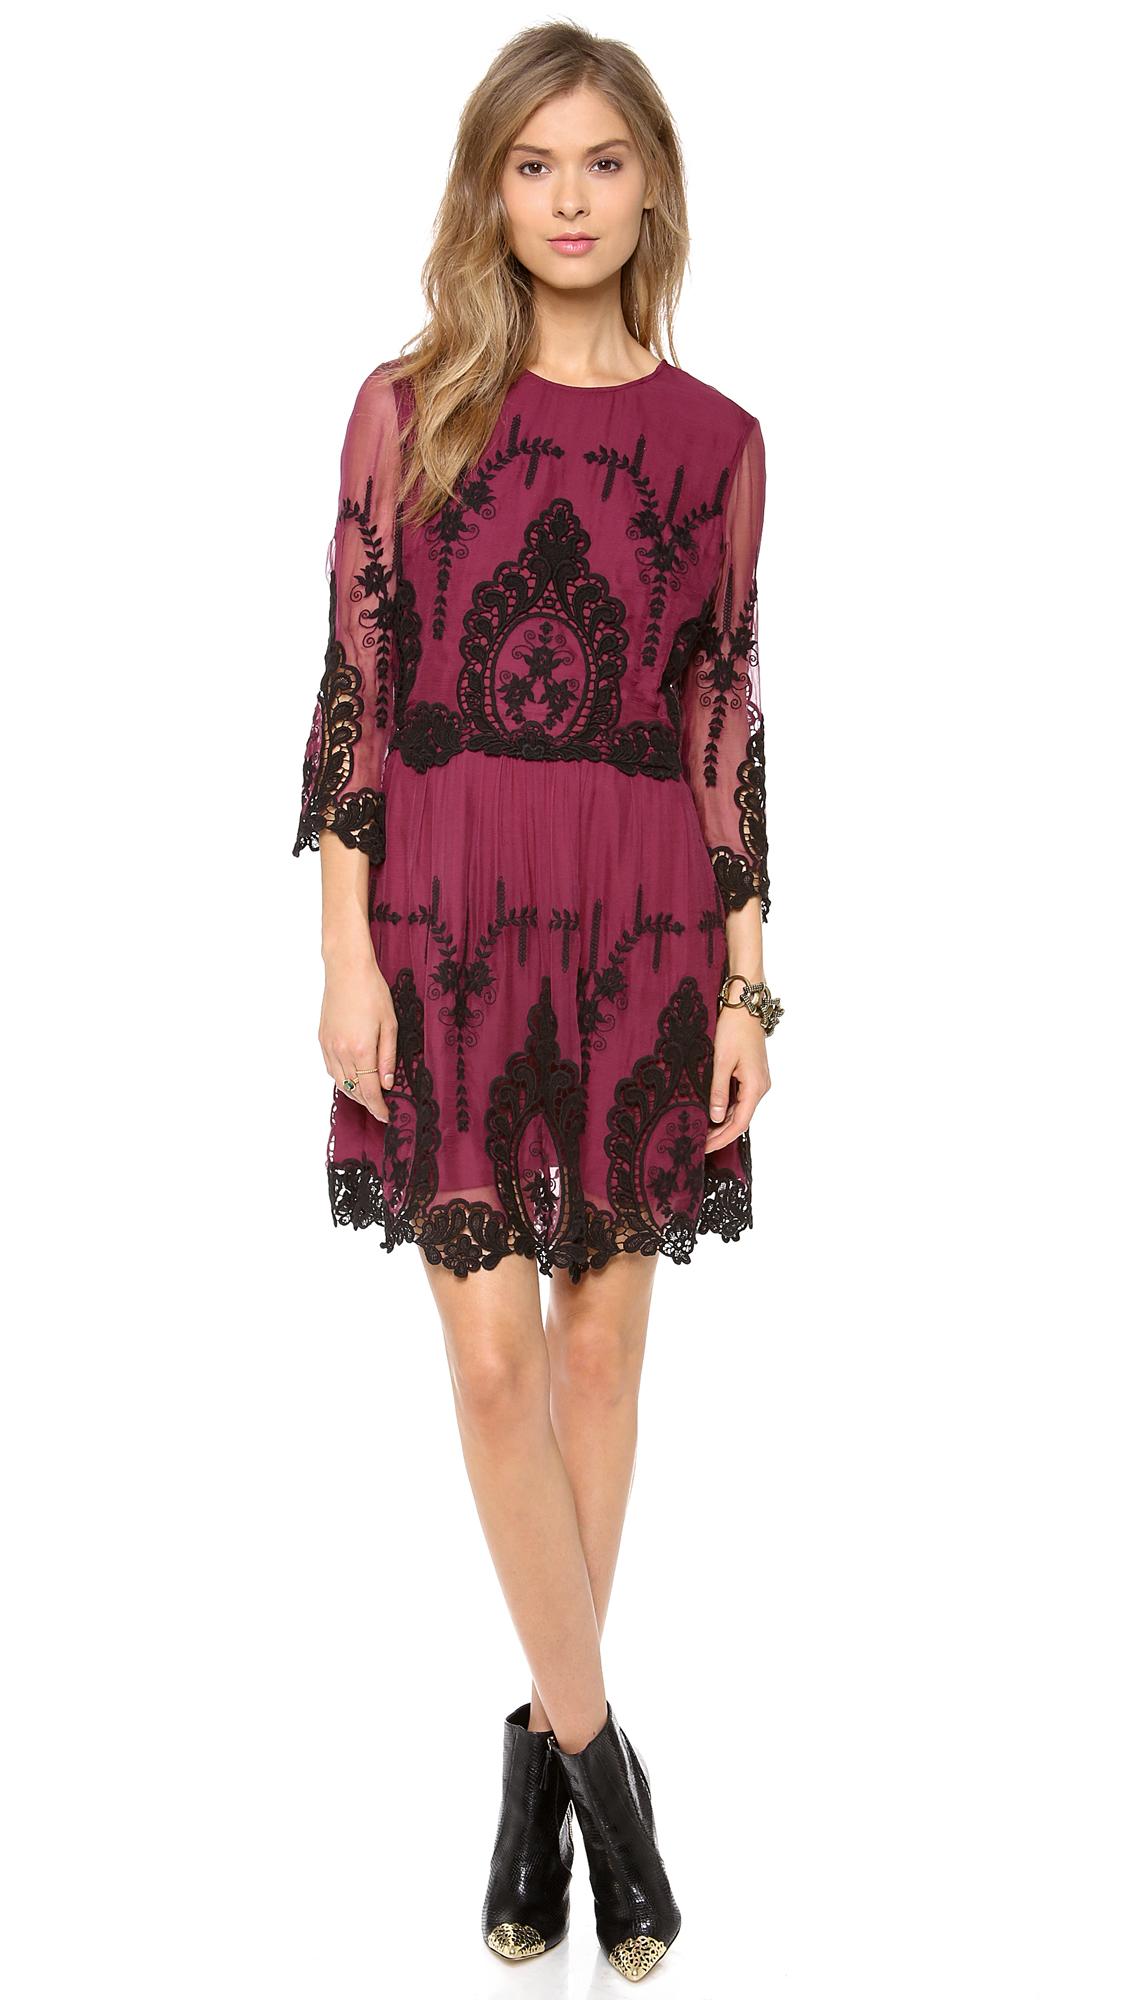 Lyst - Dolce Vita Valentina Dress in Purple